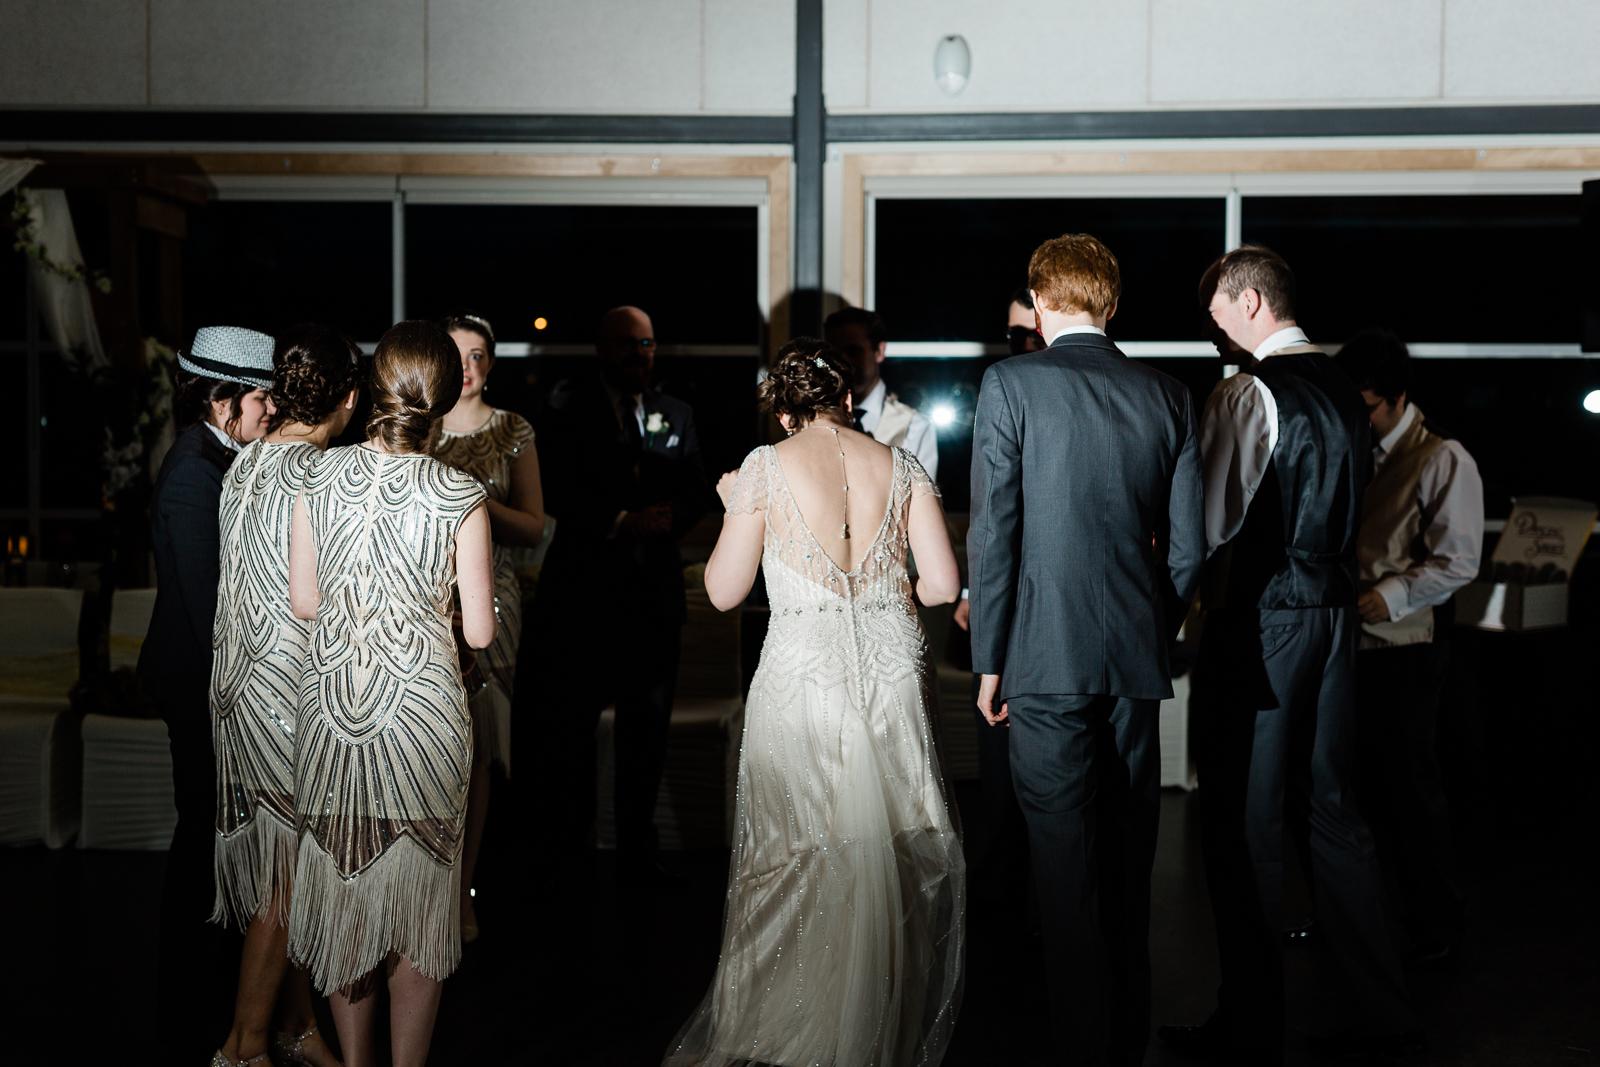 0125manuels-river-st-johns-wedding-photographer.jpg